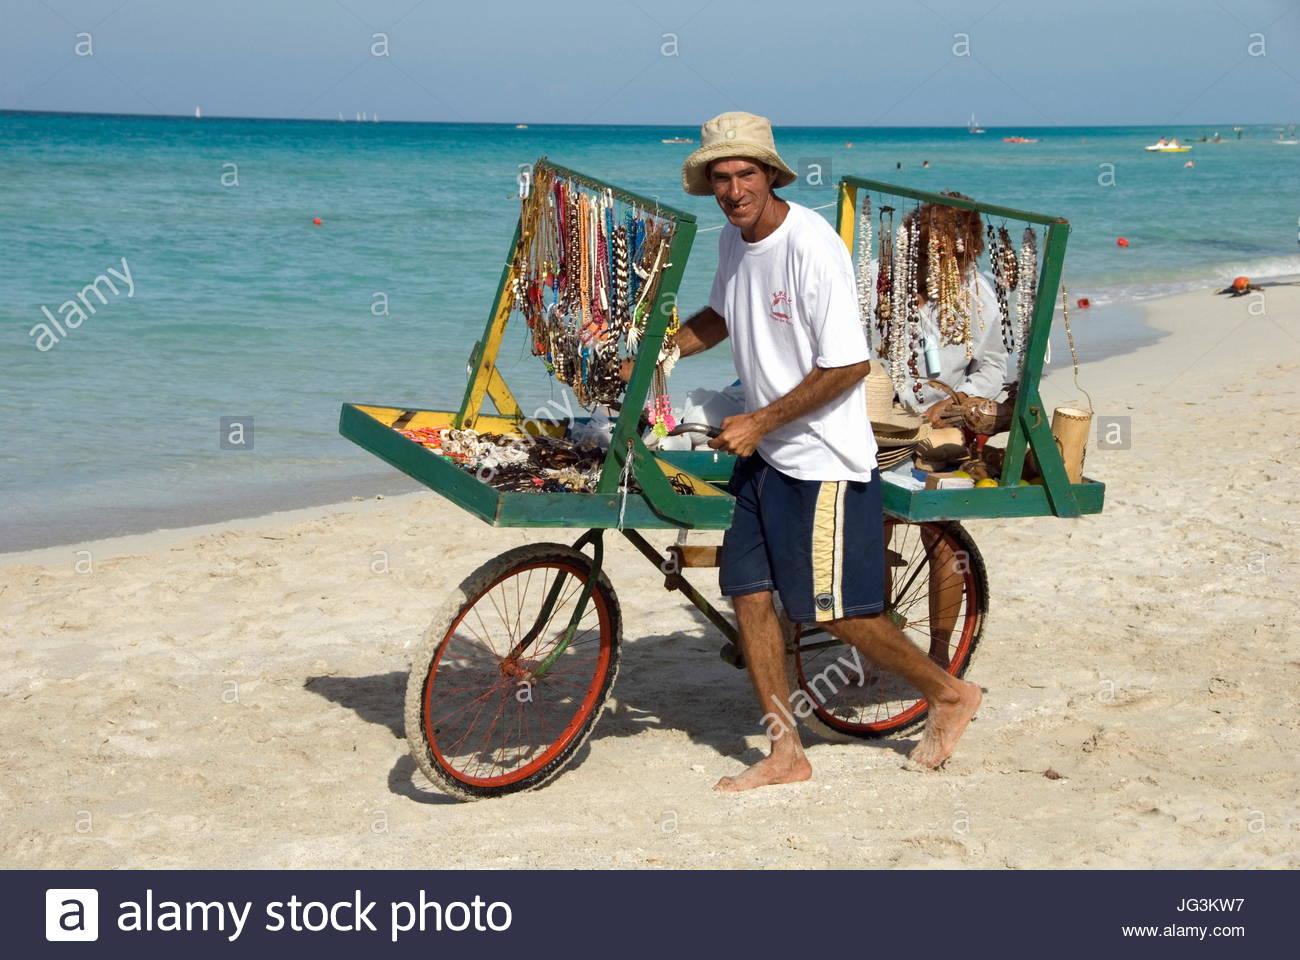 VP 5766524, Schmuckverkäufer, Varadero, Kuba, Karibik [Copyright-Hinweis: Frauke Scholz/McPHOTO/Vario Bilder] Stockbild